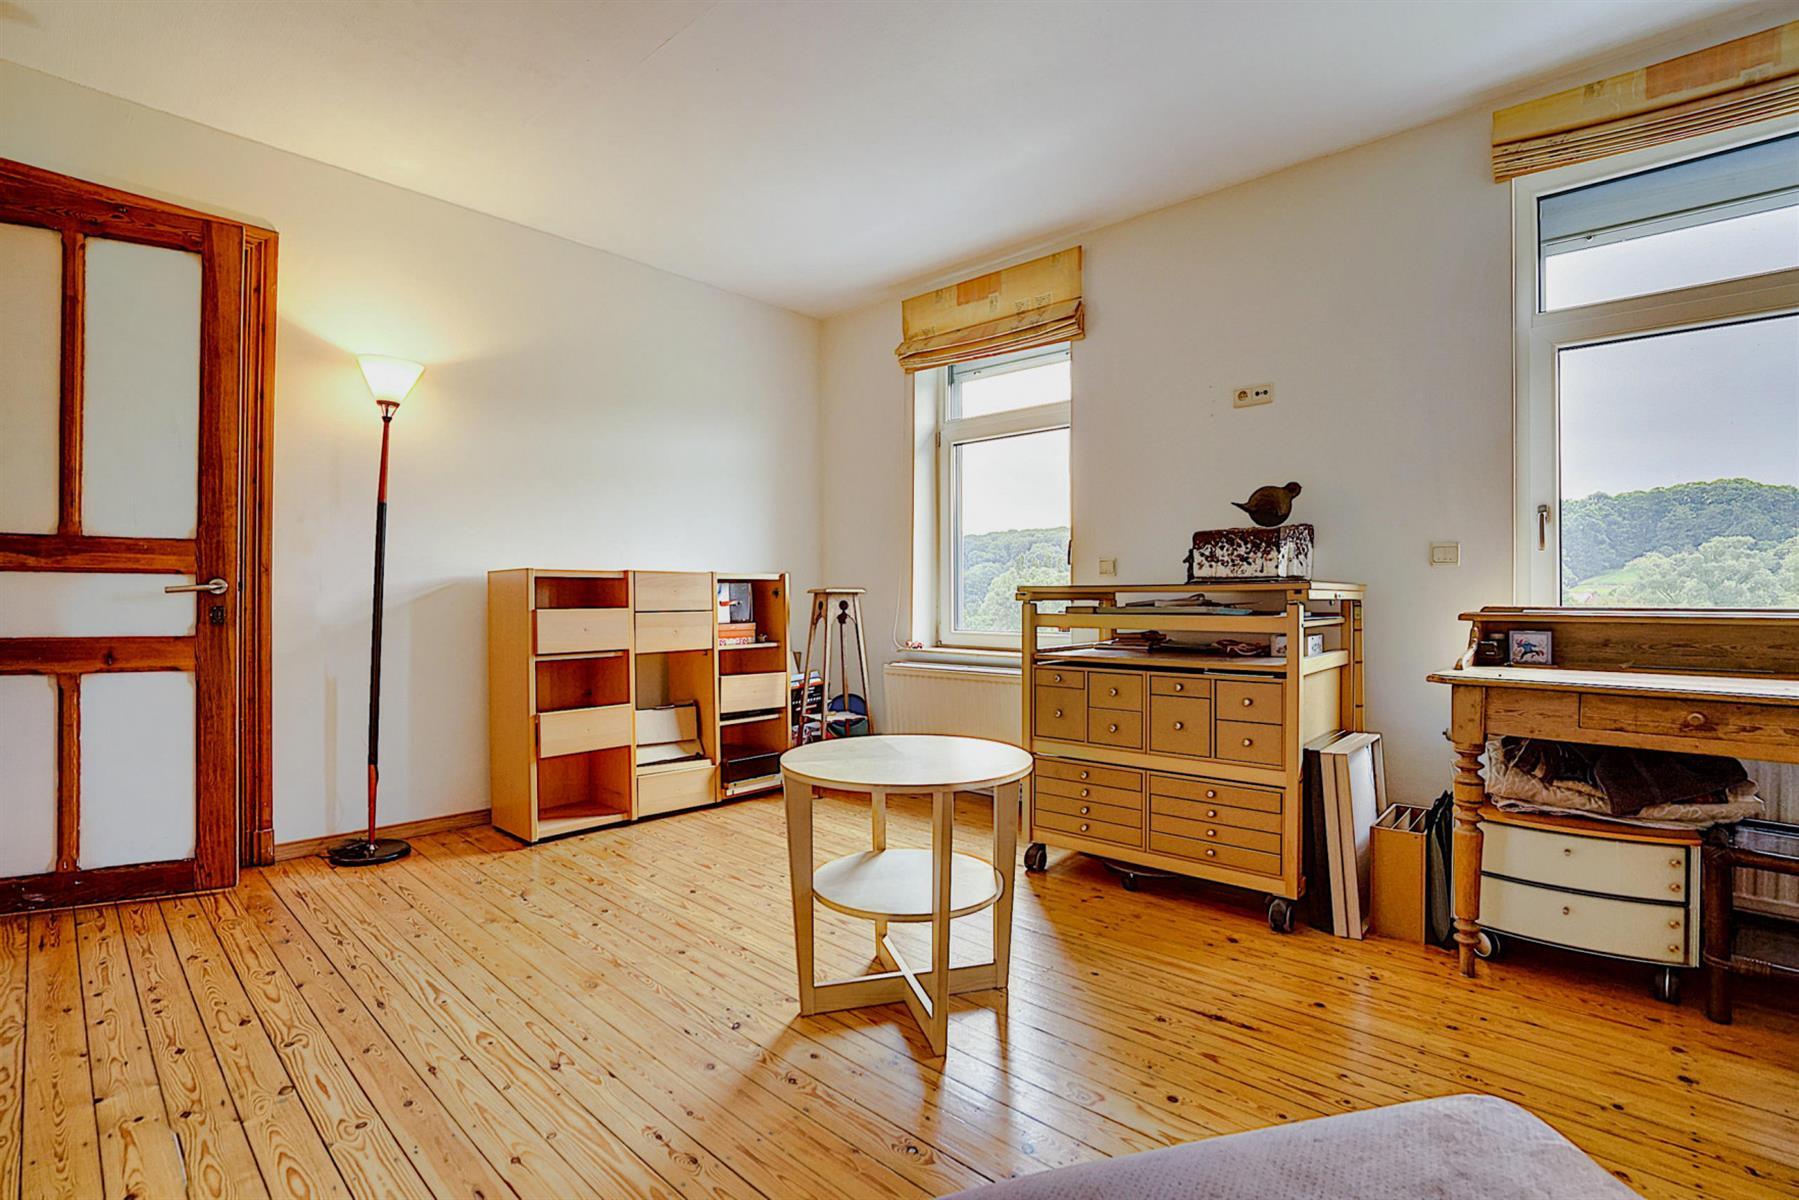 Maison - Bousval - #4395358-19